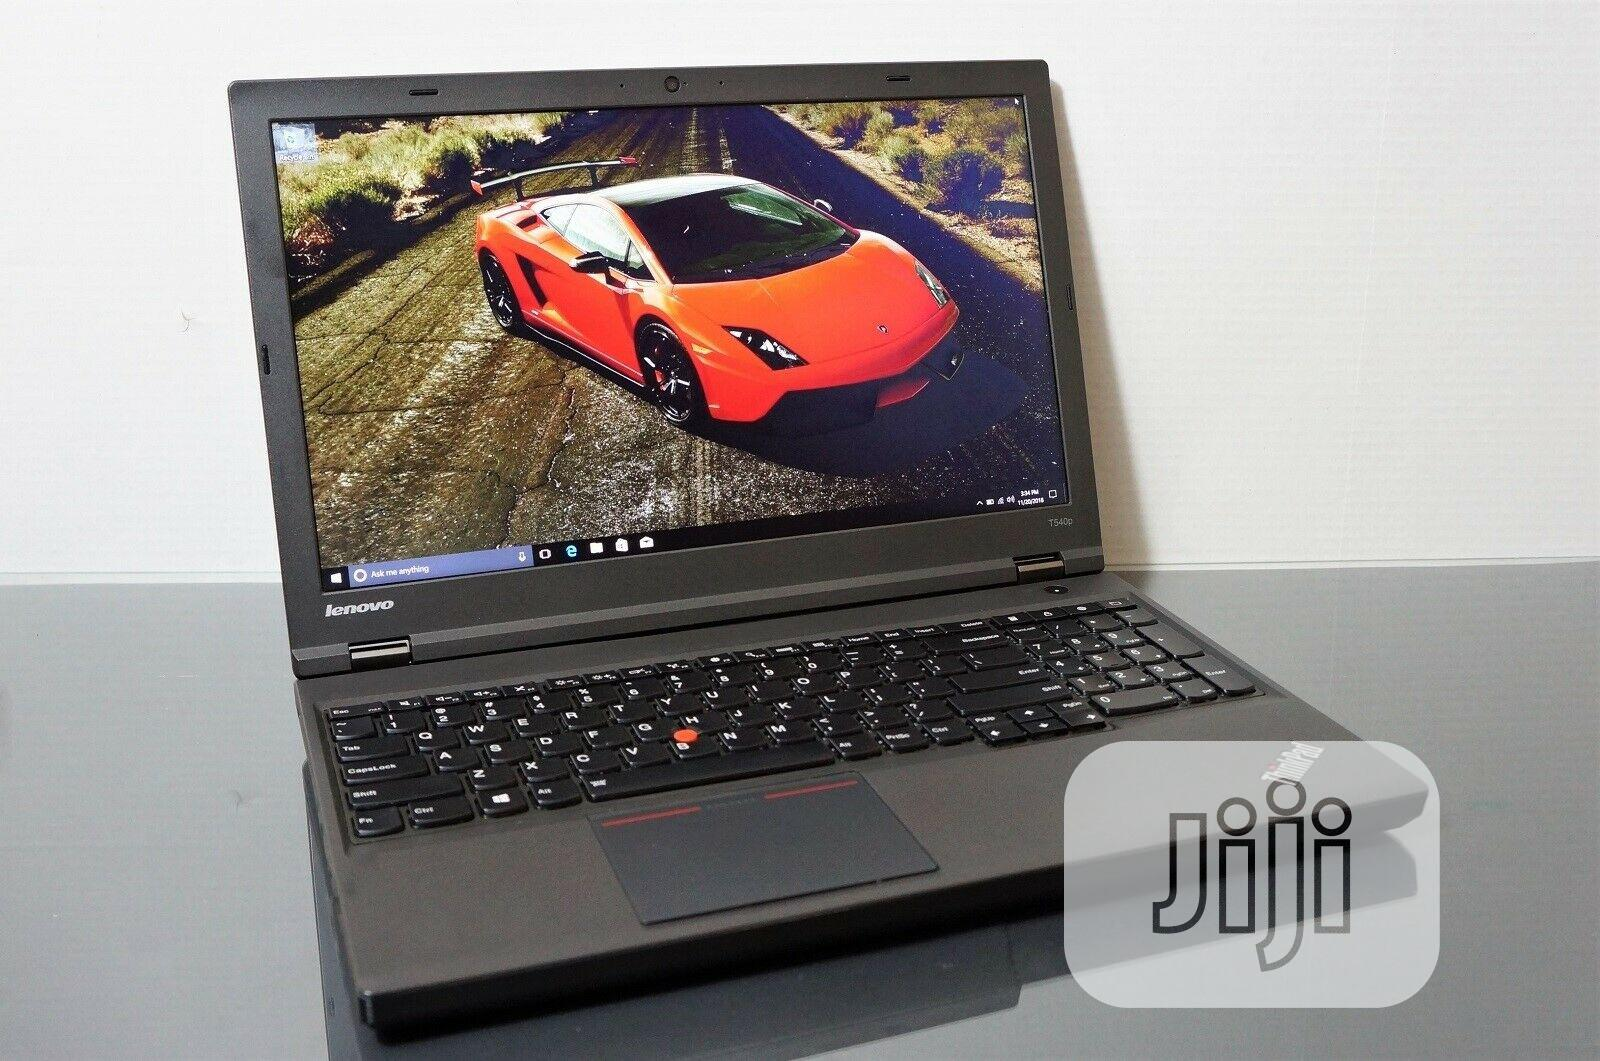 Laptop Lenovo ThinkPad T540p 8GB Intel Core I7 HDD 500GB | Laptops & Computers for sale in Enugu, Enugu State, Nigeria